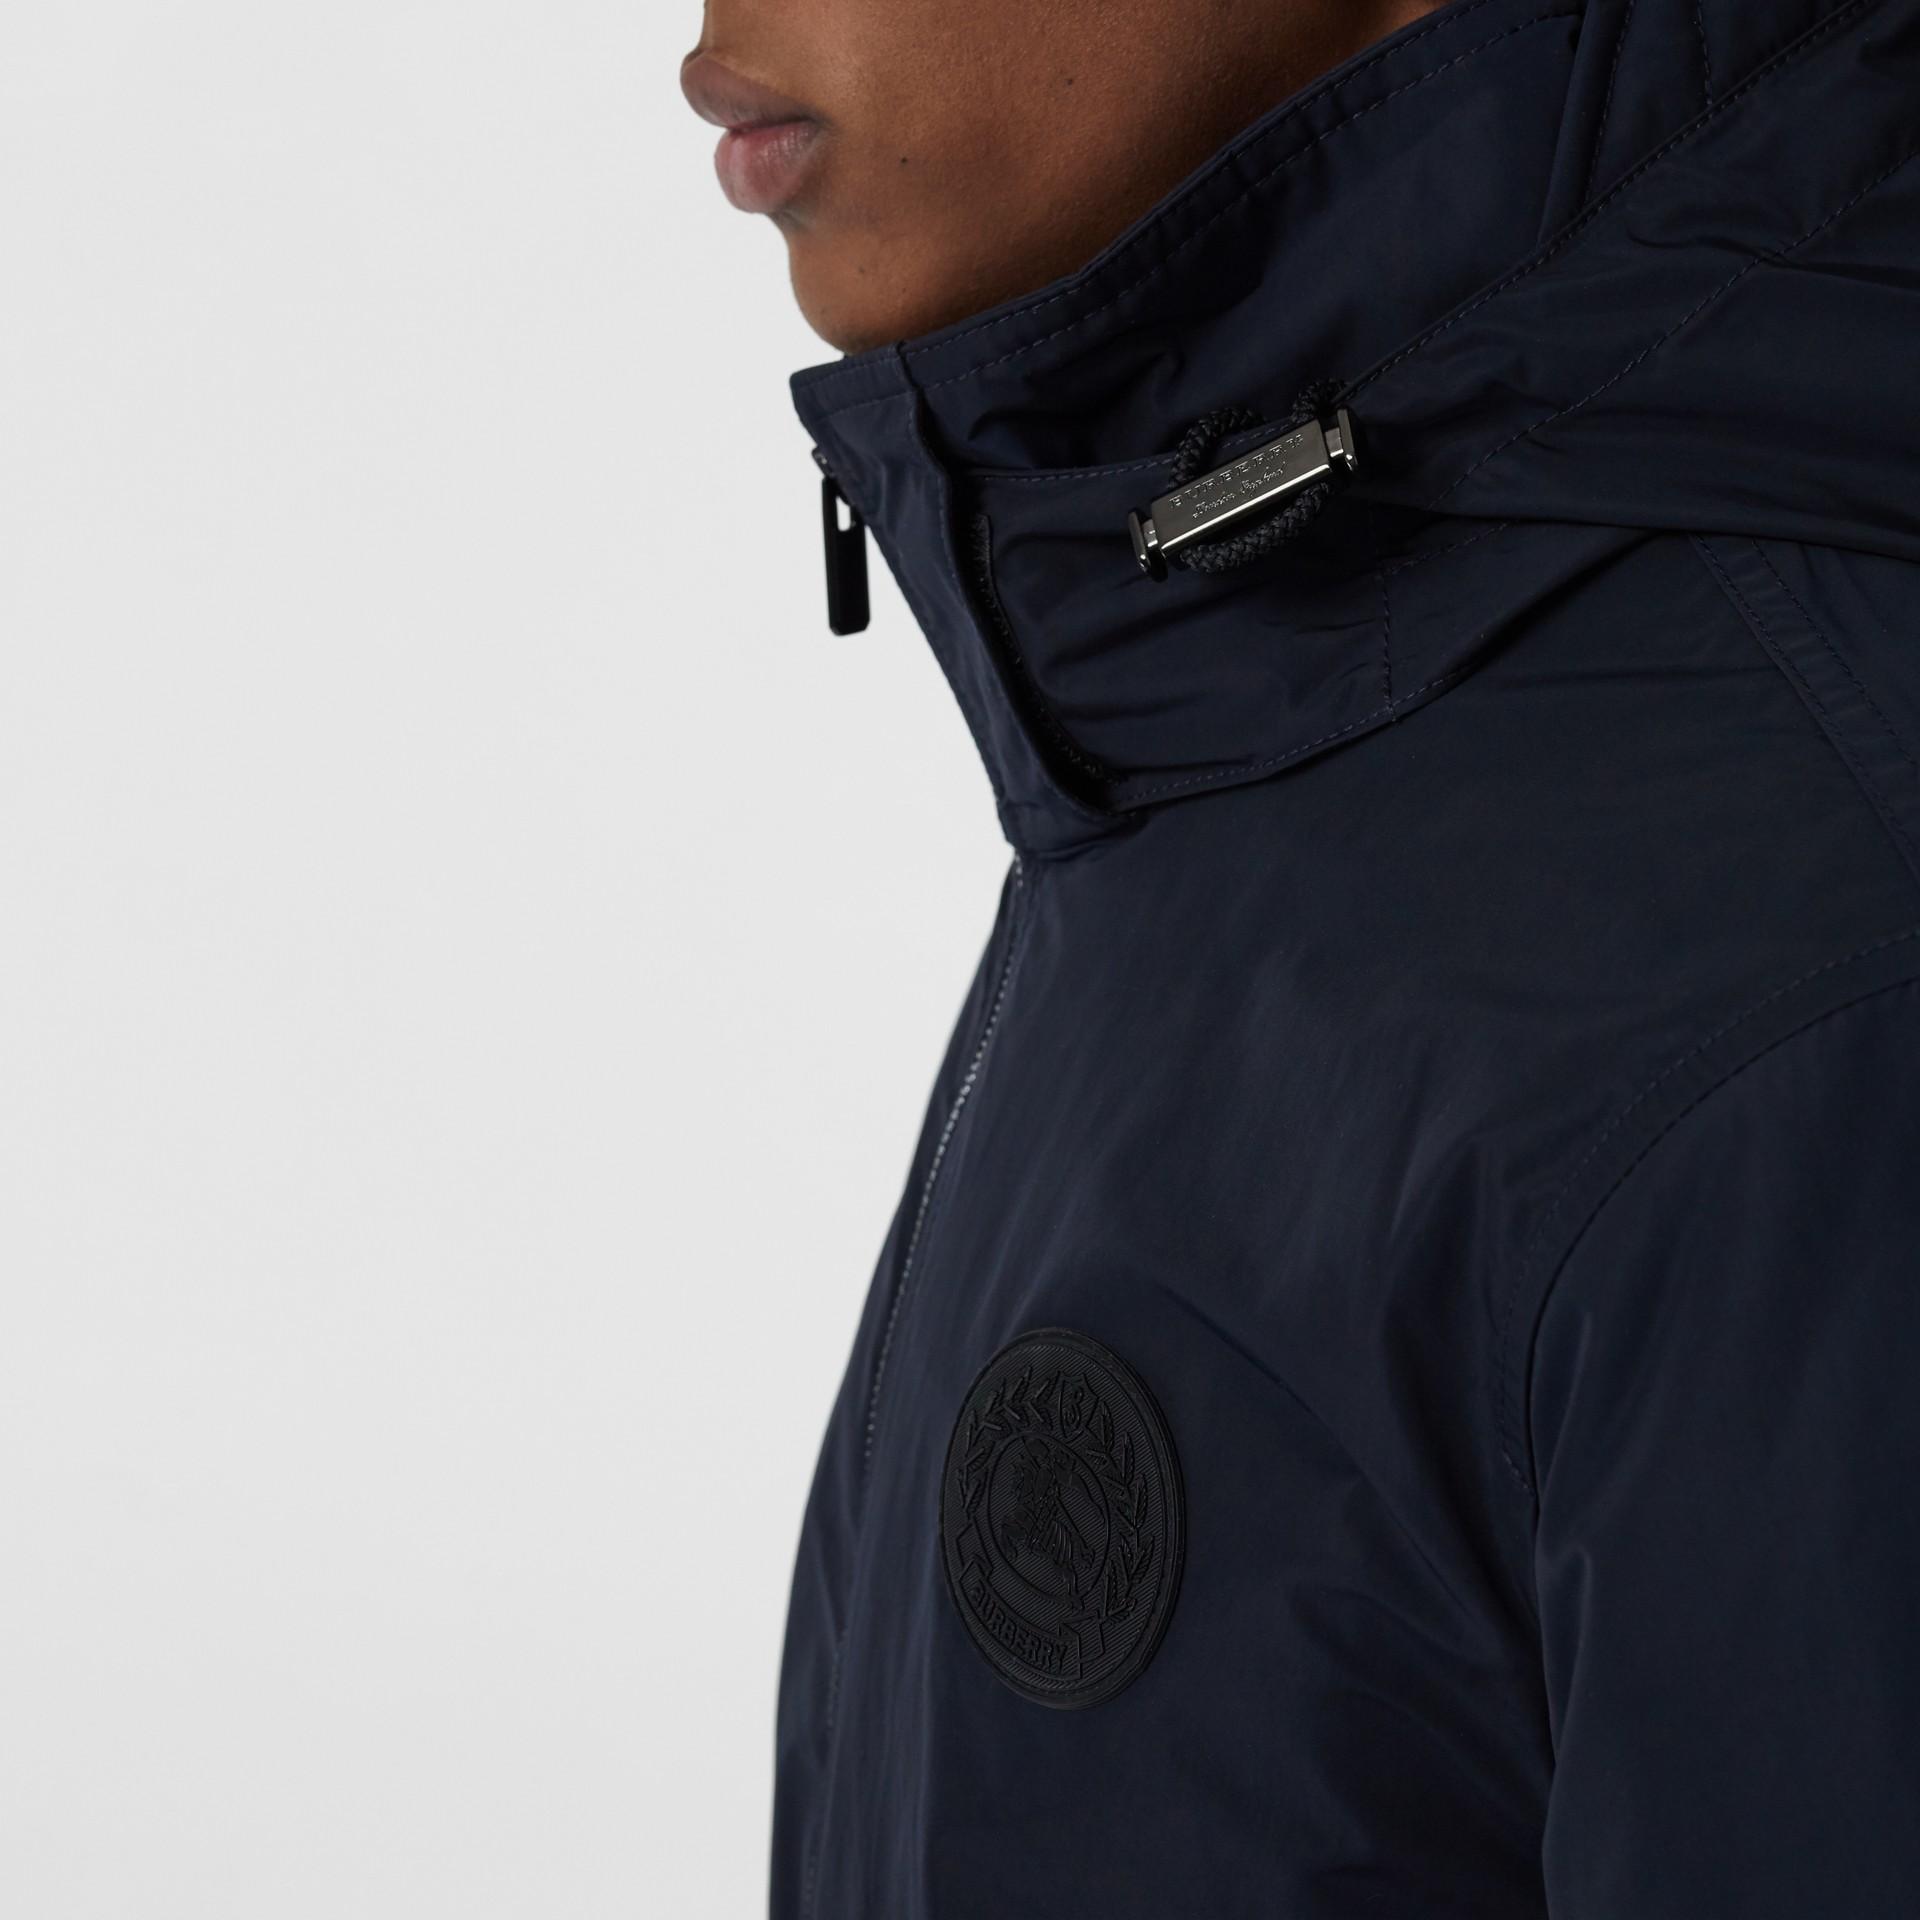 Jacke aus Taft mit Memory-Effekt und packbarer Kapuze (Tintenblau) - Herren | Burberry - Galerie-Bild 3